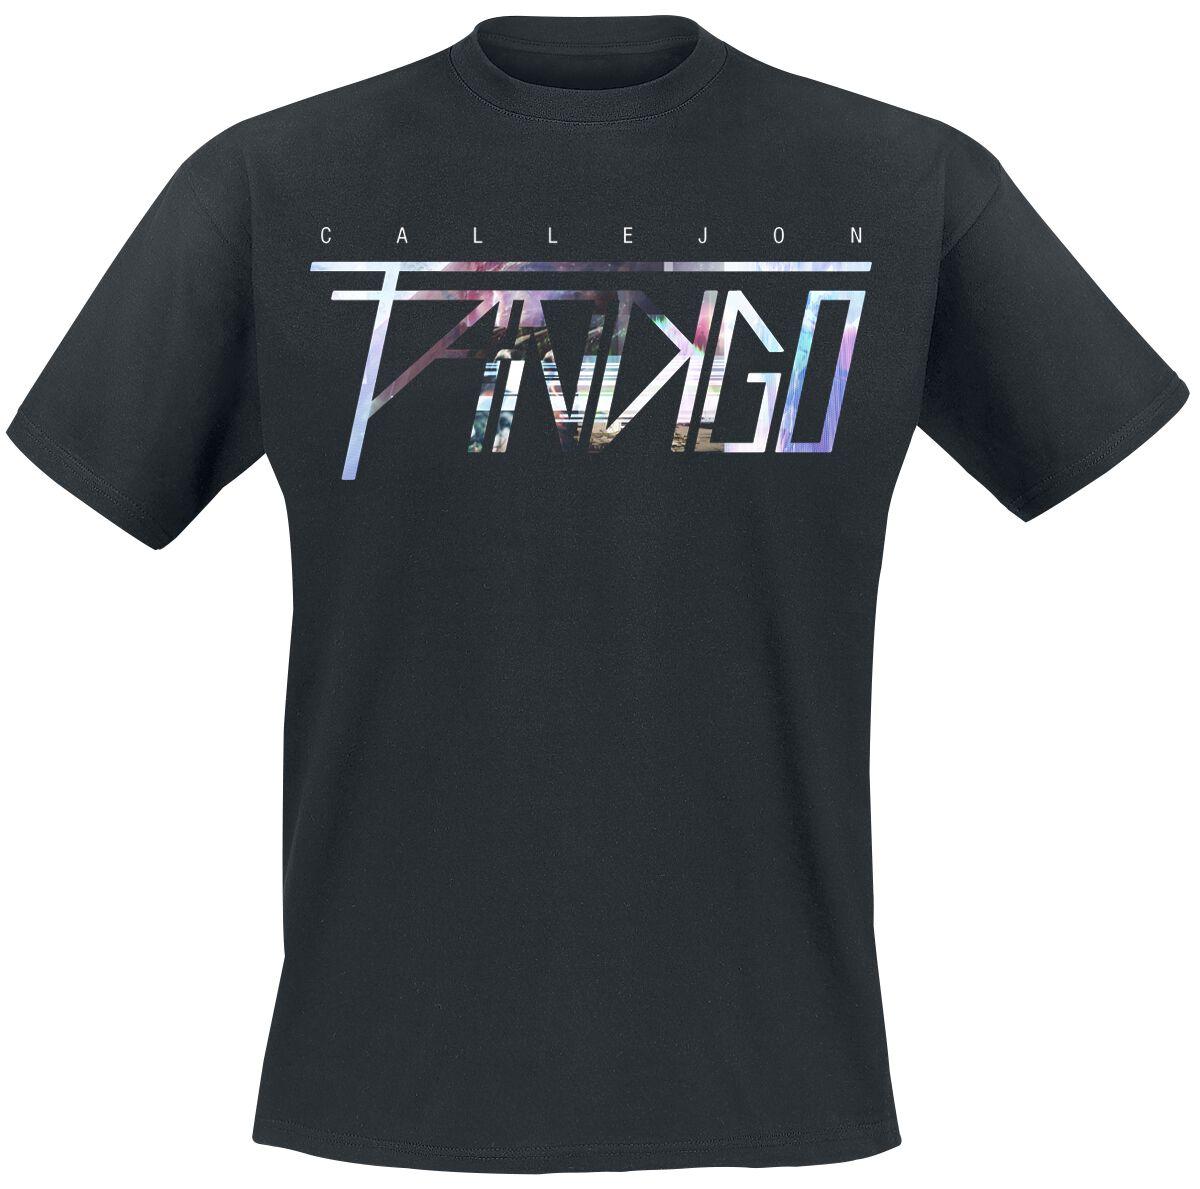 Zespoły - Koszulki - T-Shirt Callejon Fandigo Logo T-Shirt czarny - 364447